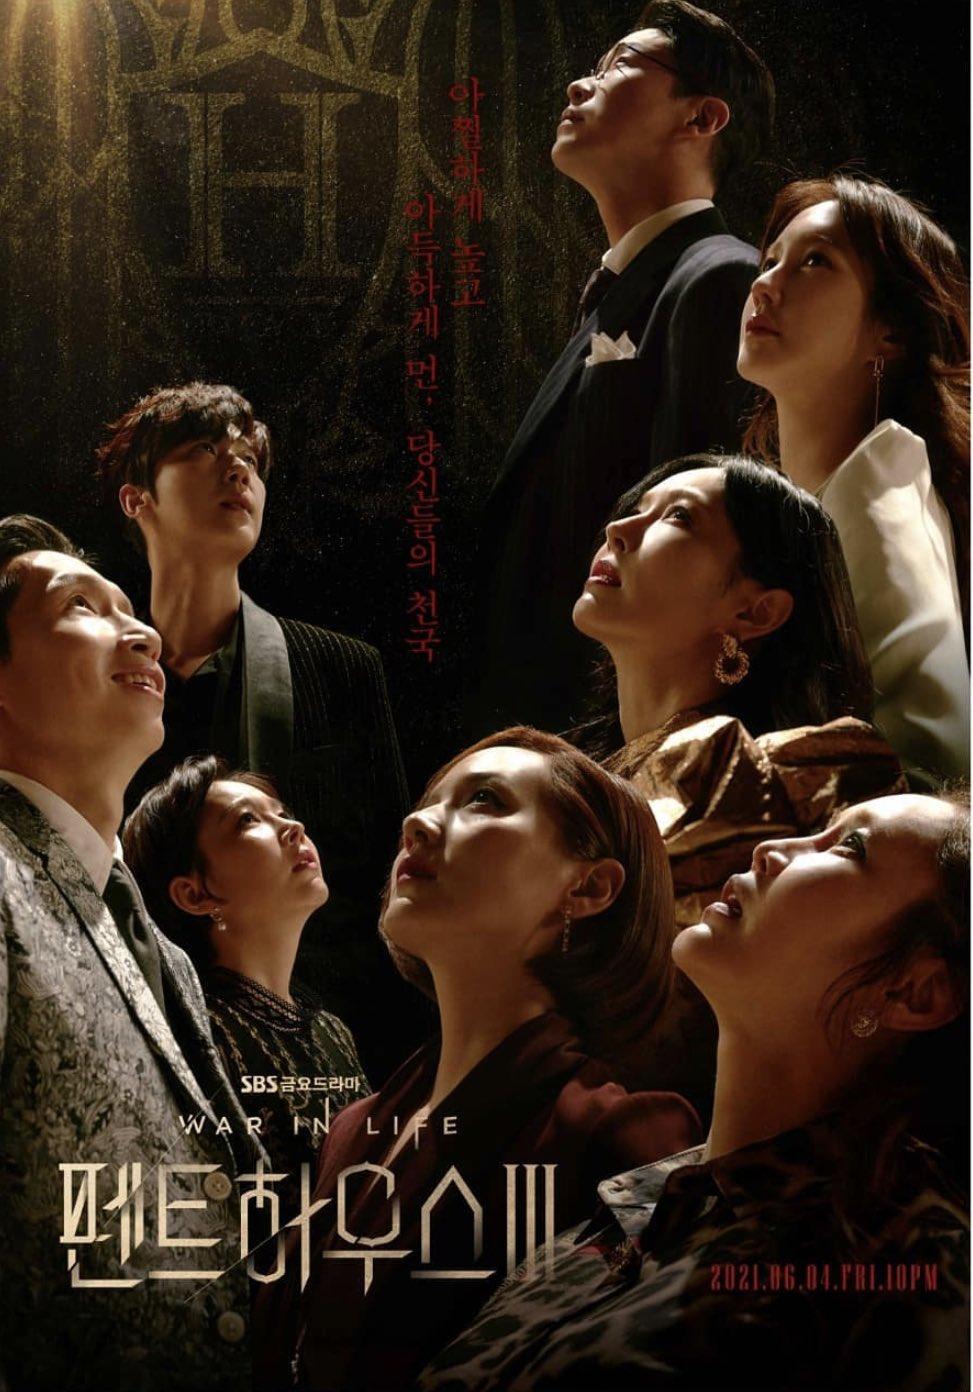 Drama Korea The Penthouse season 3 Sub Indo, Sinopsis dan Jadwal Tayang